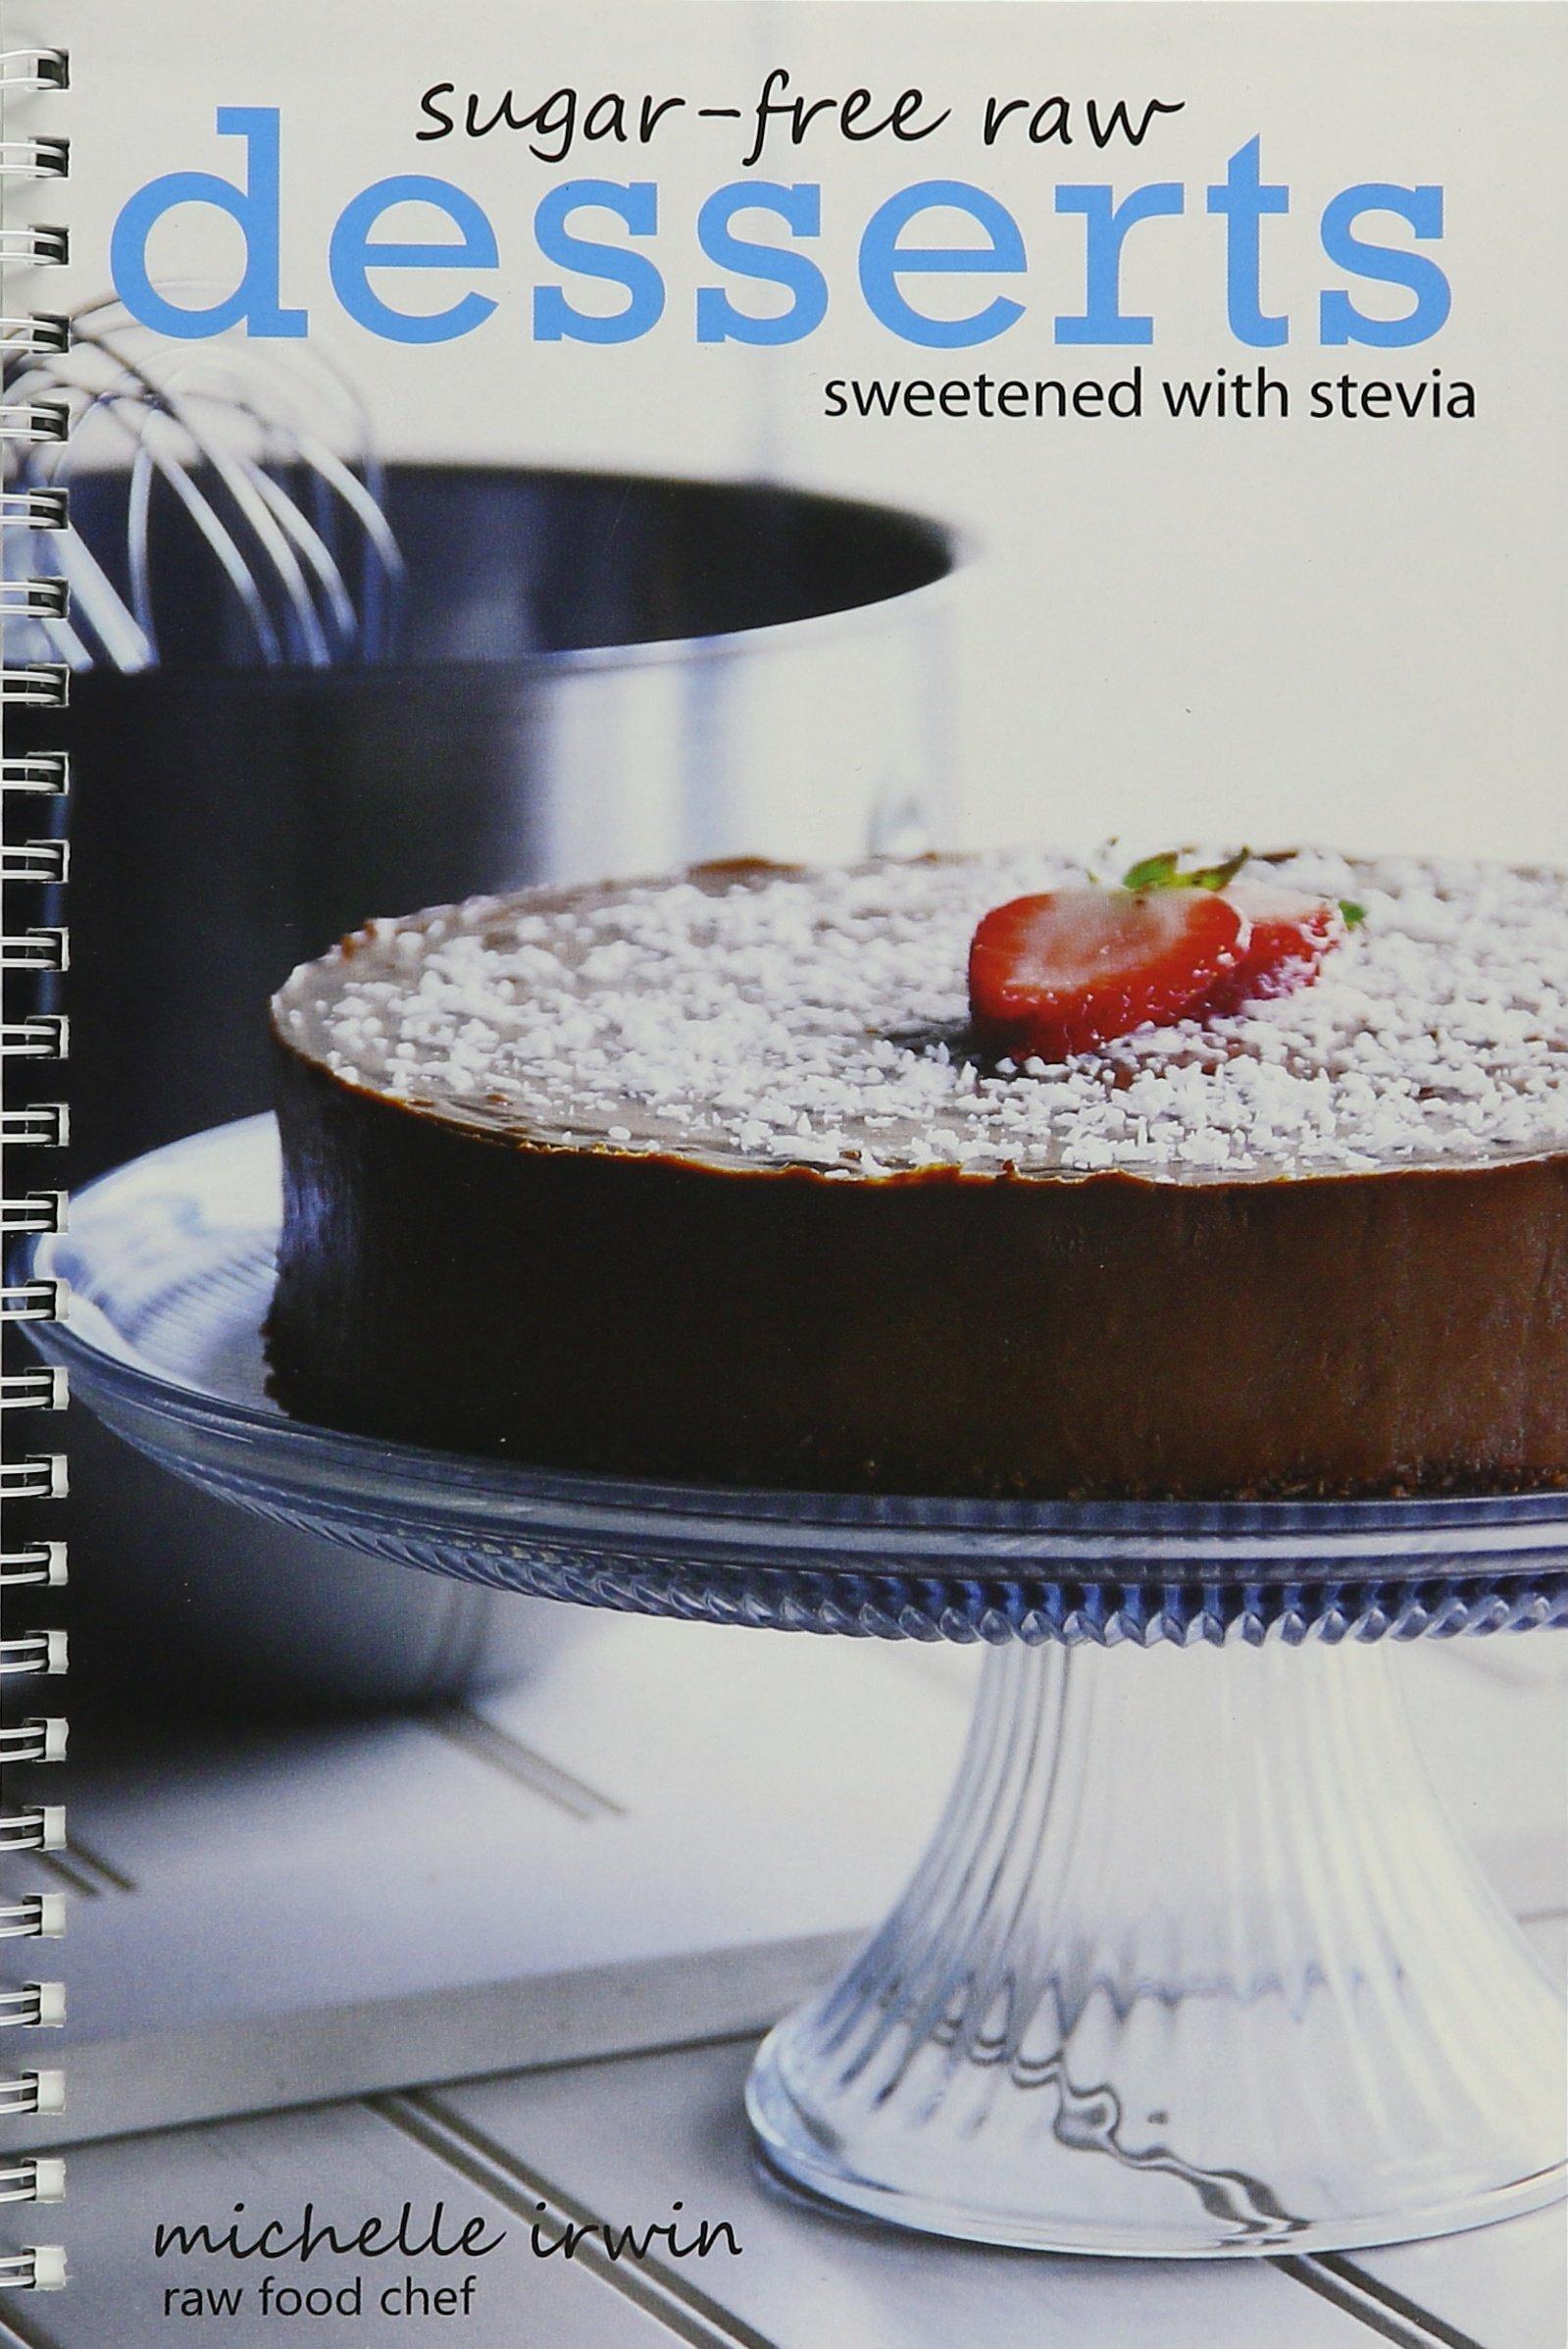 Sugar Free Raw Desserts Sweetened With Stevia By Michelle Irwin Michelle Irwin 9780578089294 Amazon Com Books